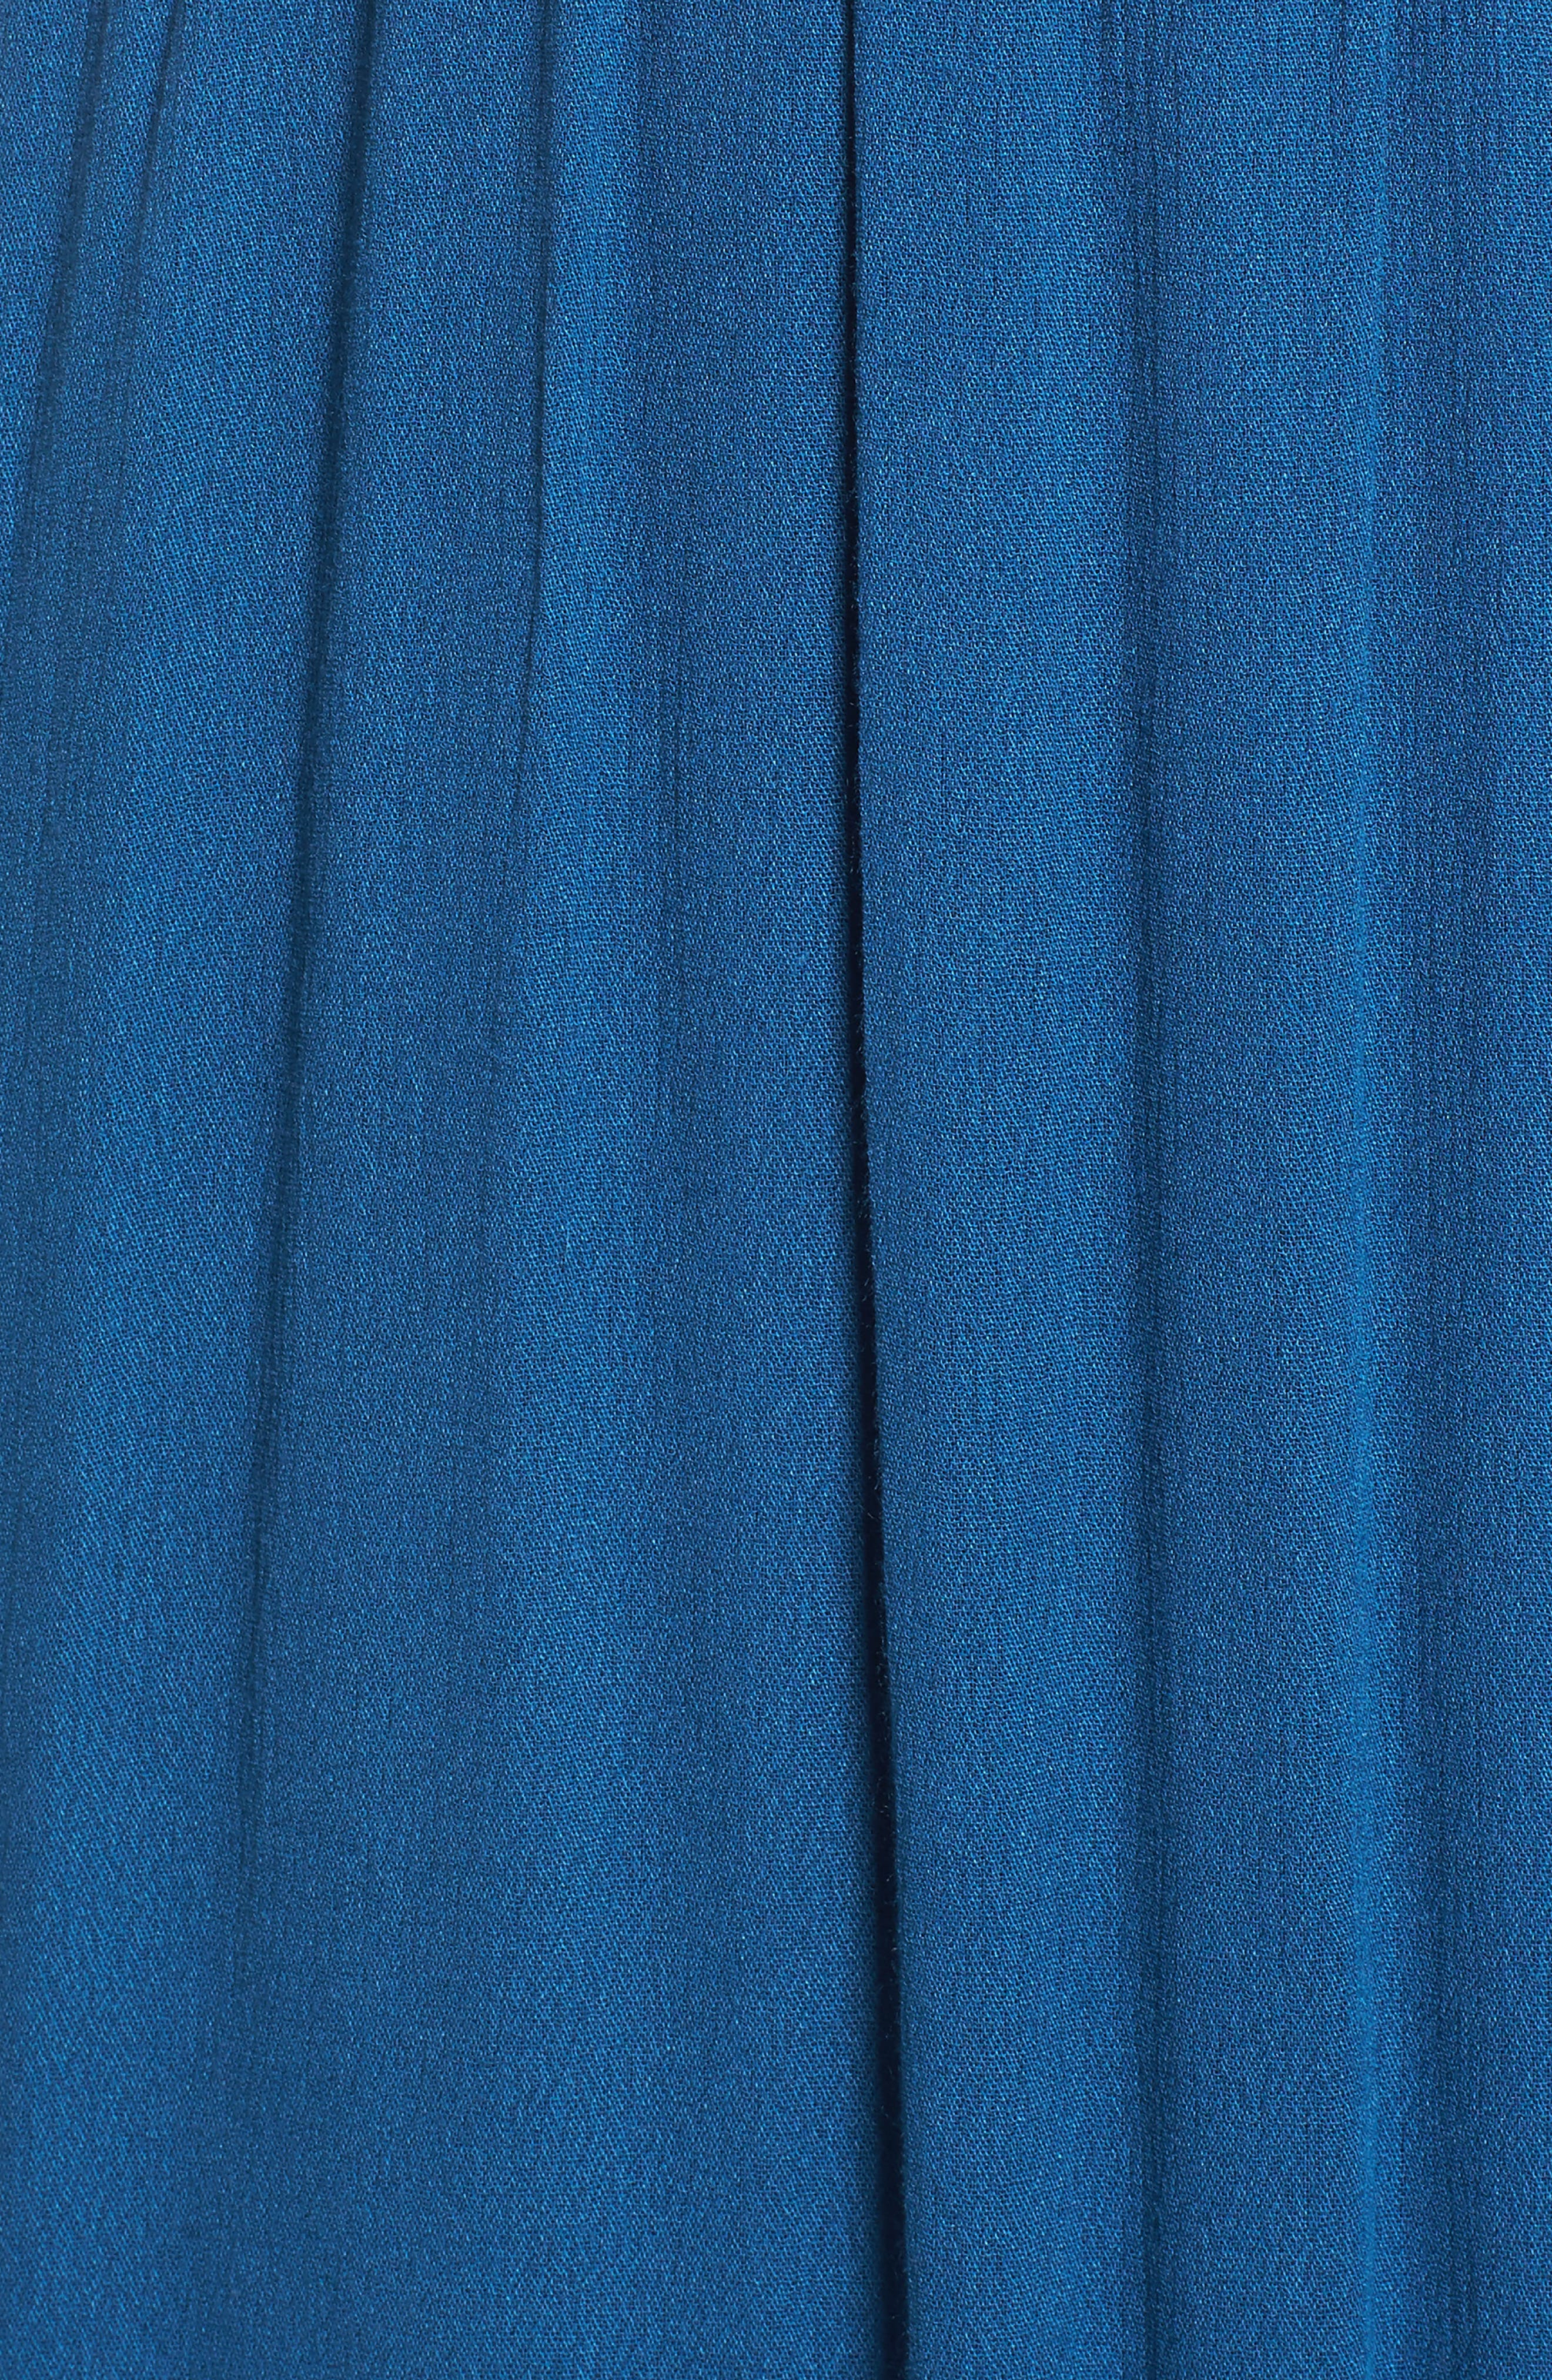 Sailor Smocked Maxi Dress,                             Alternate thumbnail 5, color,                             410